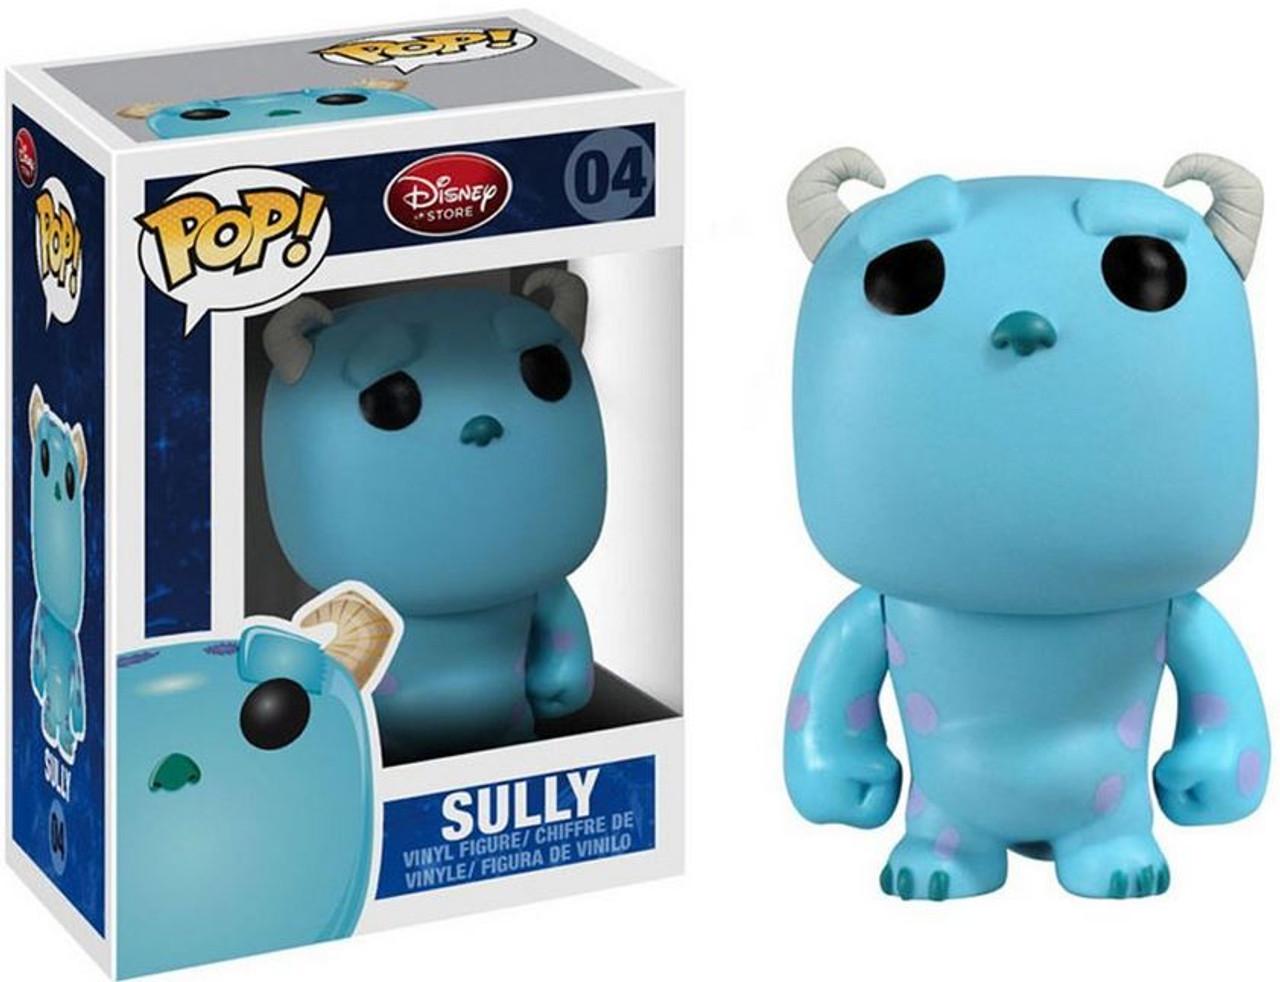 Disney / Pixar Monsters Inc Funko POP! Disney Sulley Vinyl Figure #04